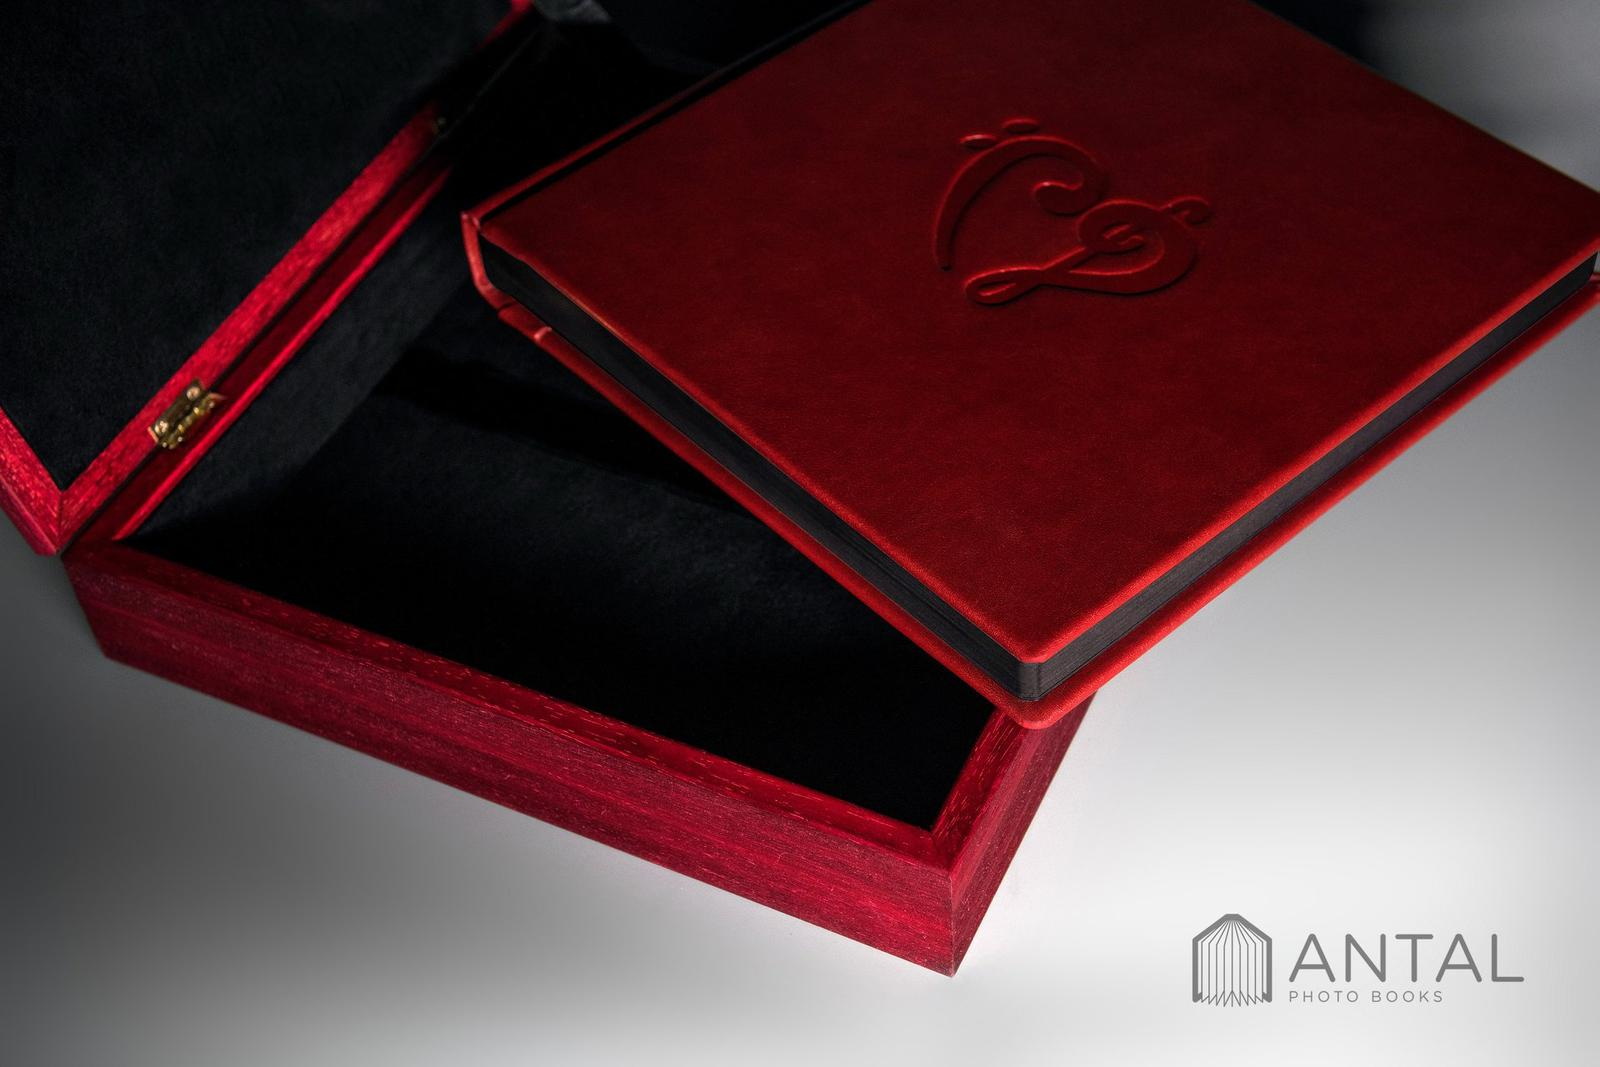 Antalphotobooks handmade photobook - Navrhnite si vlastnú fotoknihu www.antaphotobooks.com